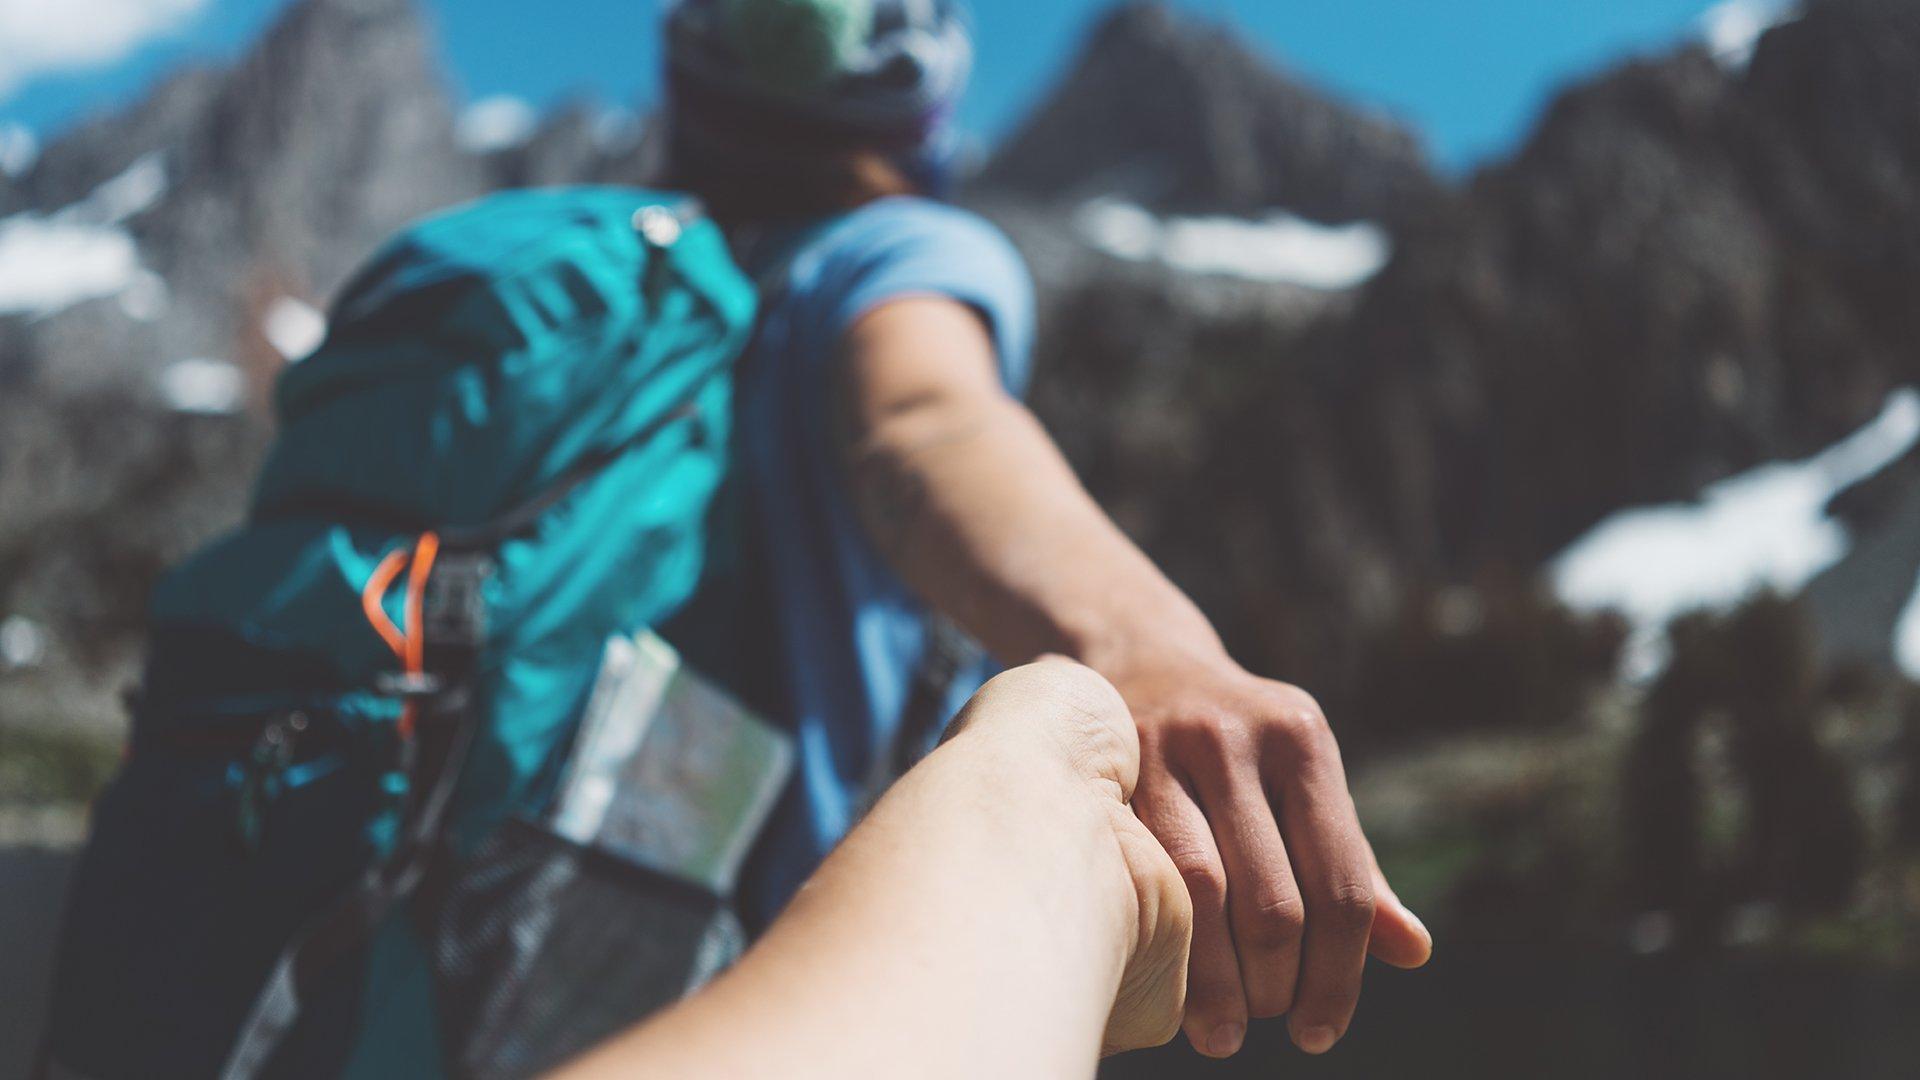 Follow the mountain guide